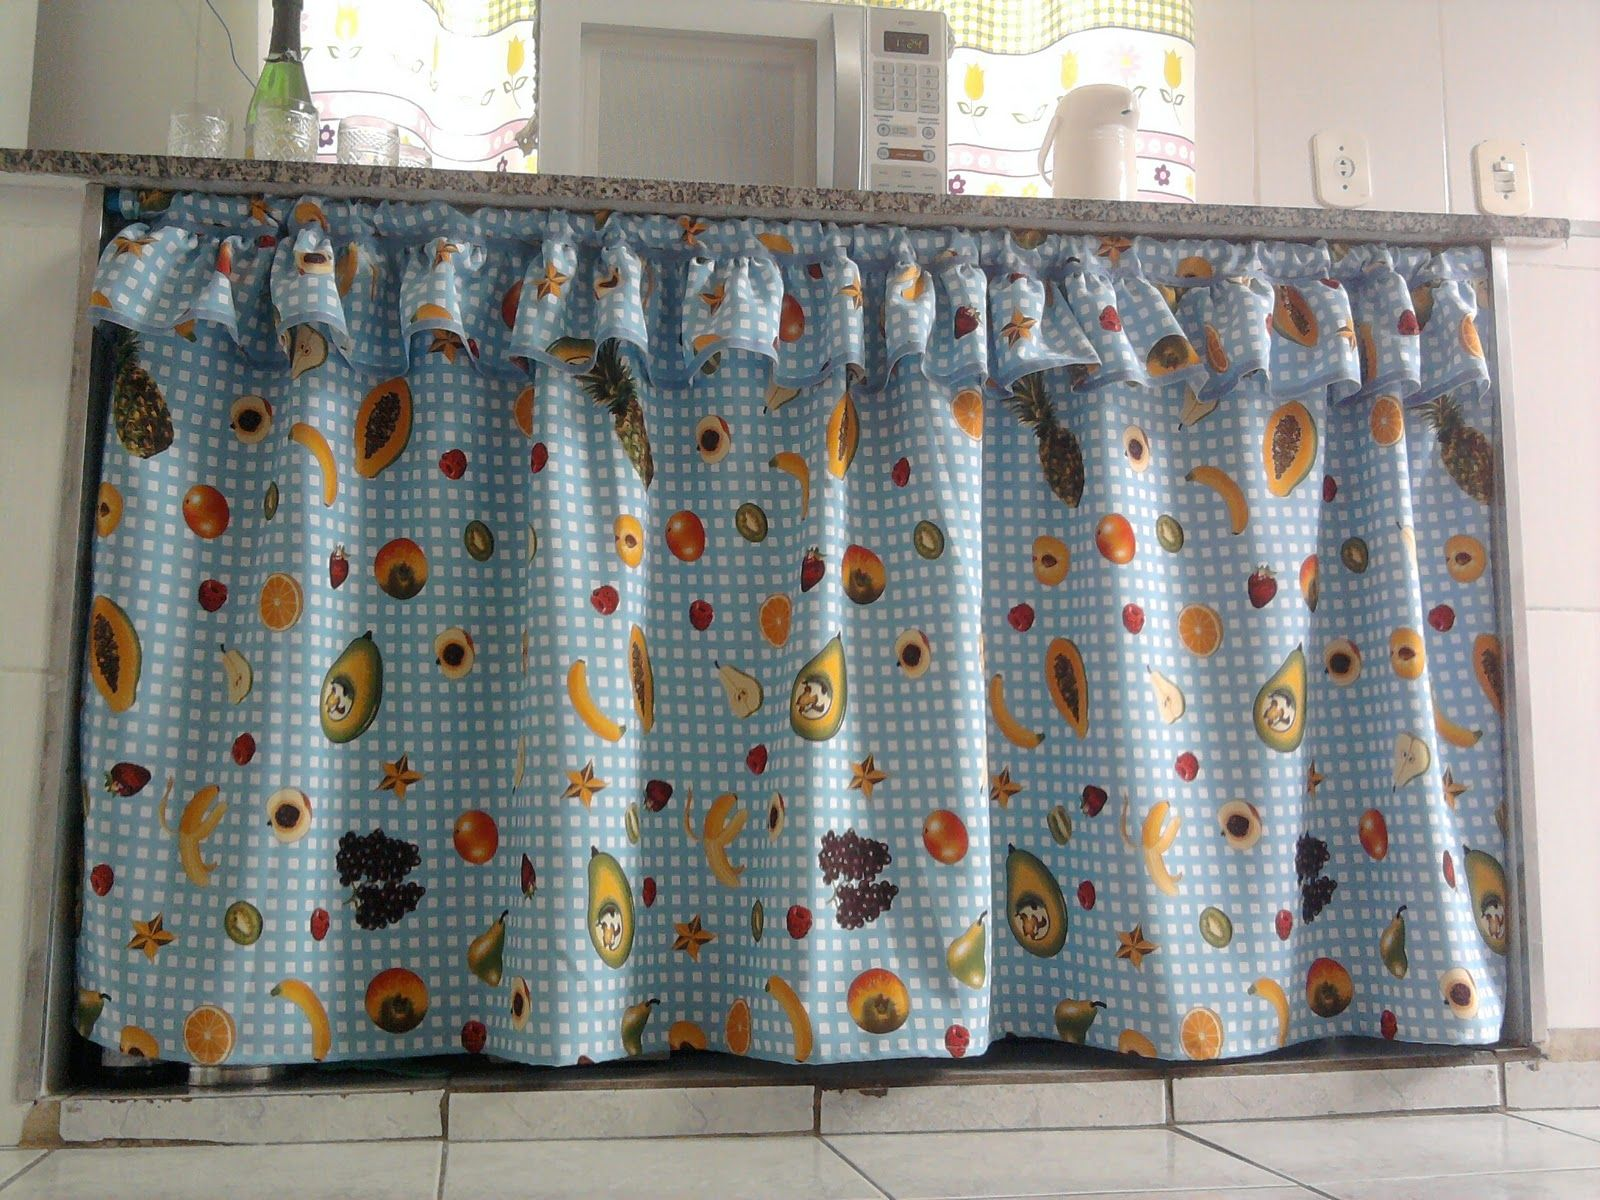 Cortina Pia Cozinha Jpg 1600 1200 Mom S Bathroom Curtains